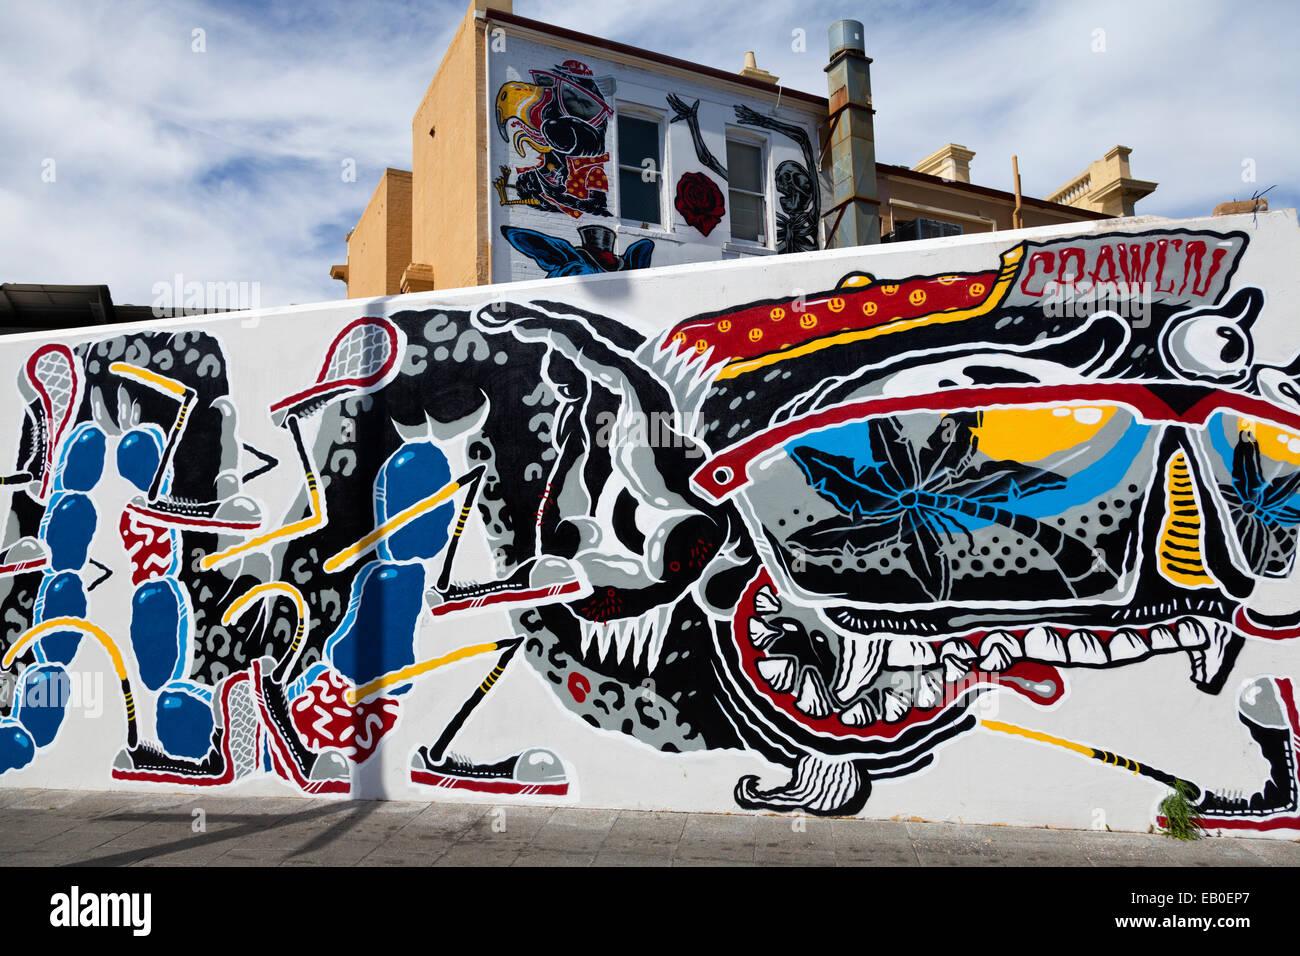 Converse Sneakers Clash Wall Art Freo Fremantle Australia - Stock Image